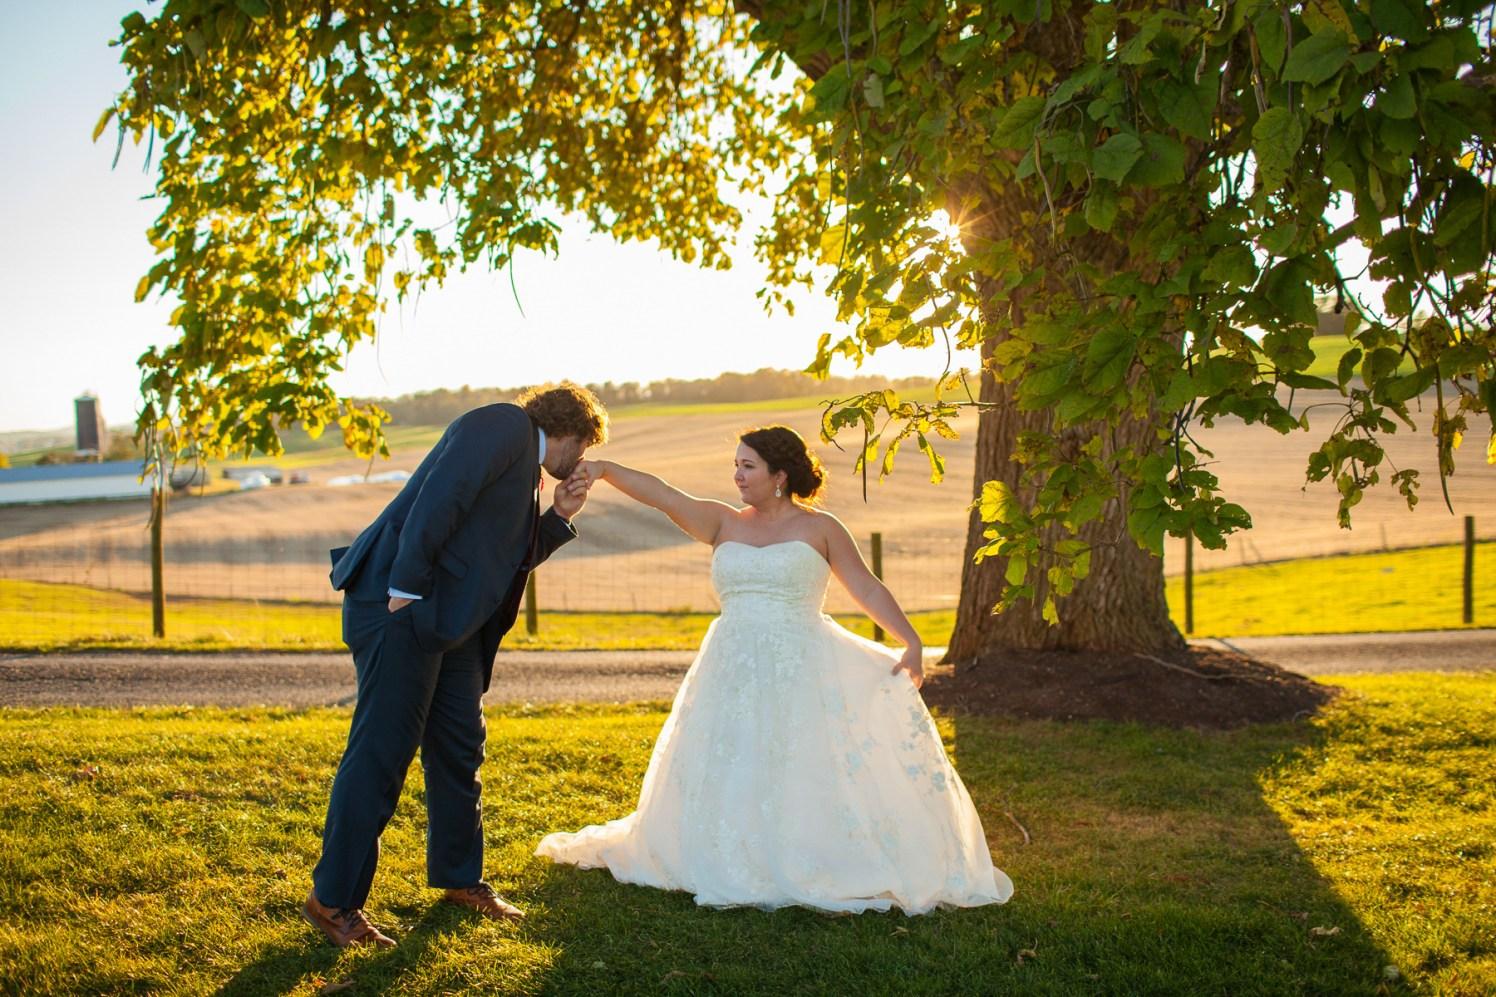 Mary + Patrick Wedding On Sunny Slope Farm Wedding Venue by Feather & Oak Photography (27 of 31)